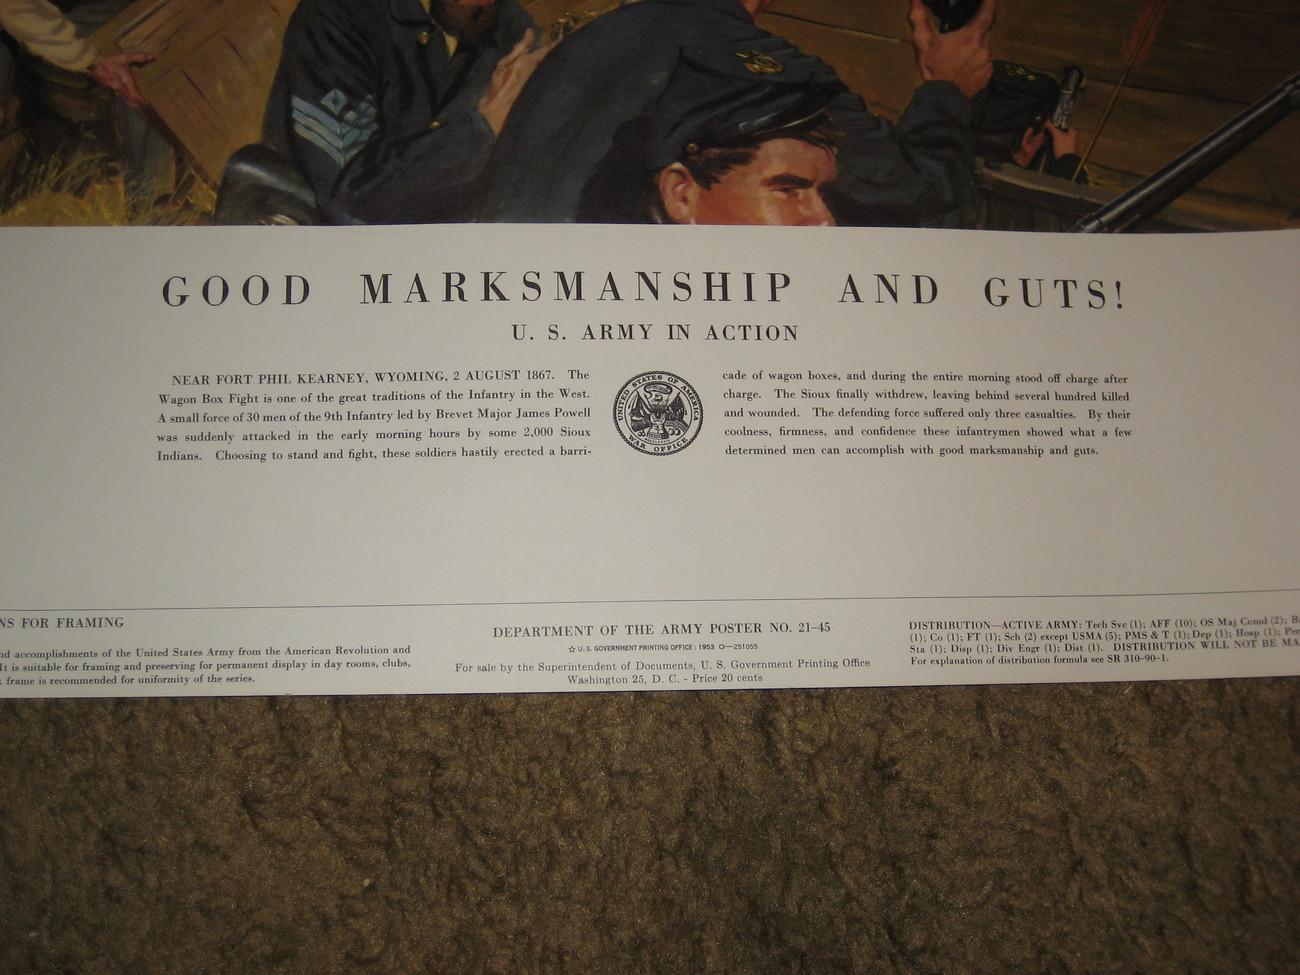 1953 U.S.Army Poster 21-45--Good Marksmanship And Guts